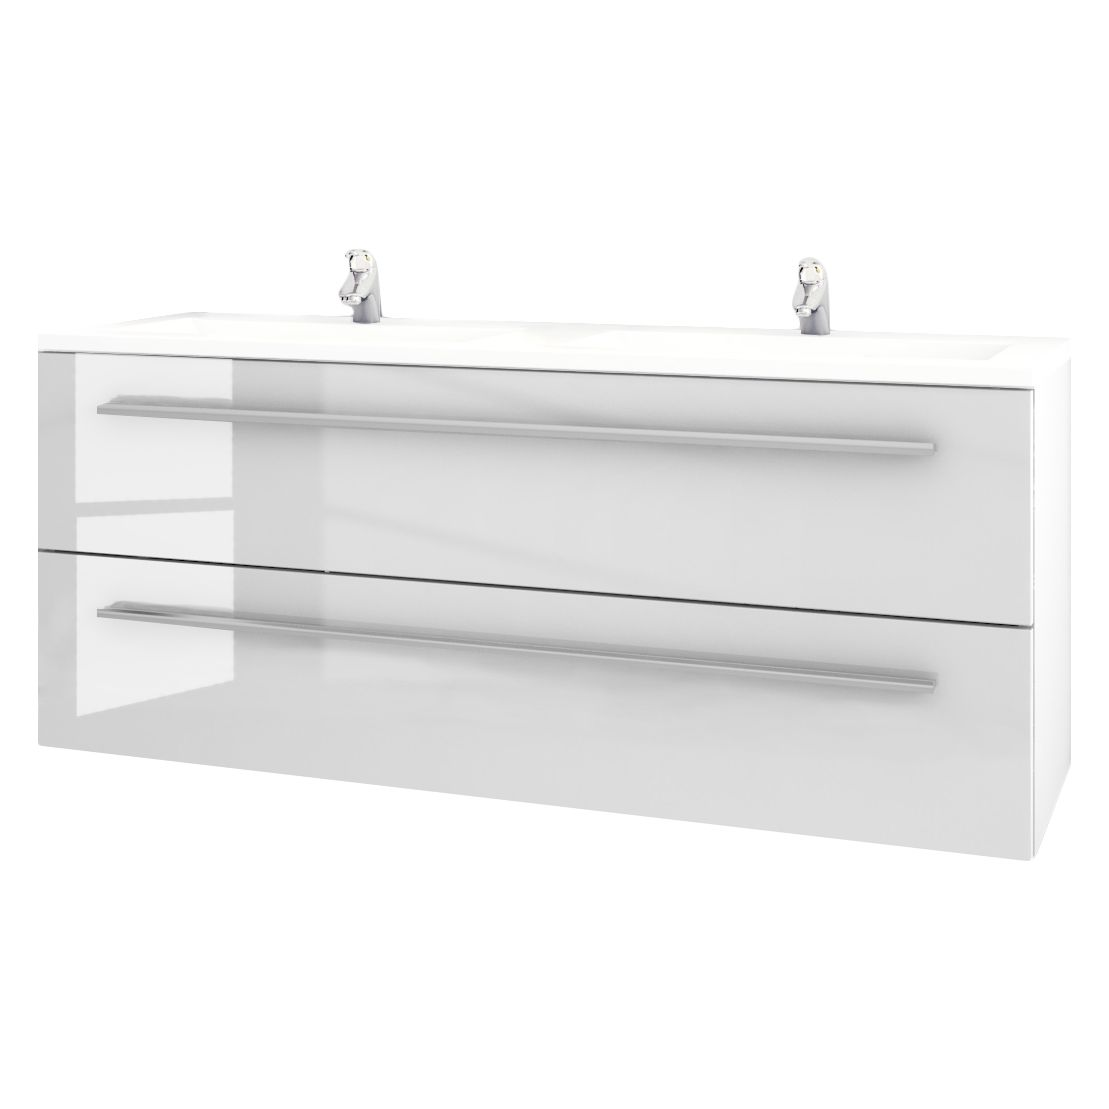 Doppelwaschtisch Libato - Weiß - 120 cm, Sieper